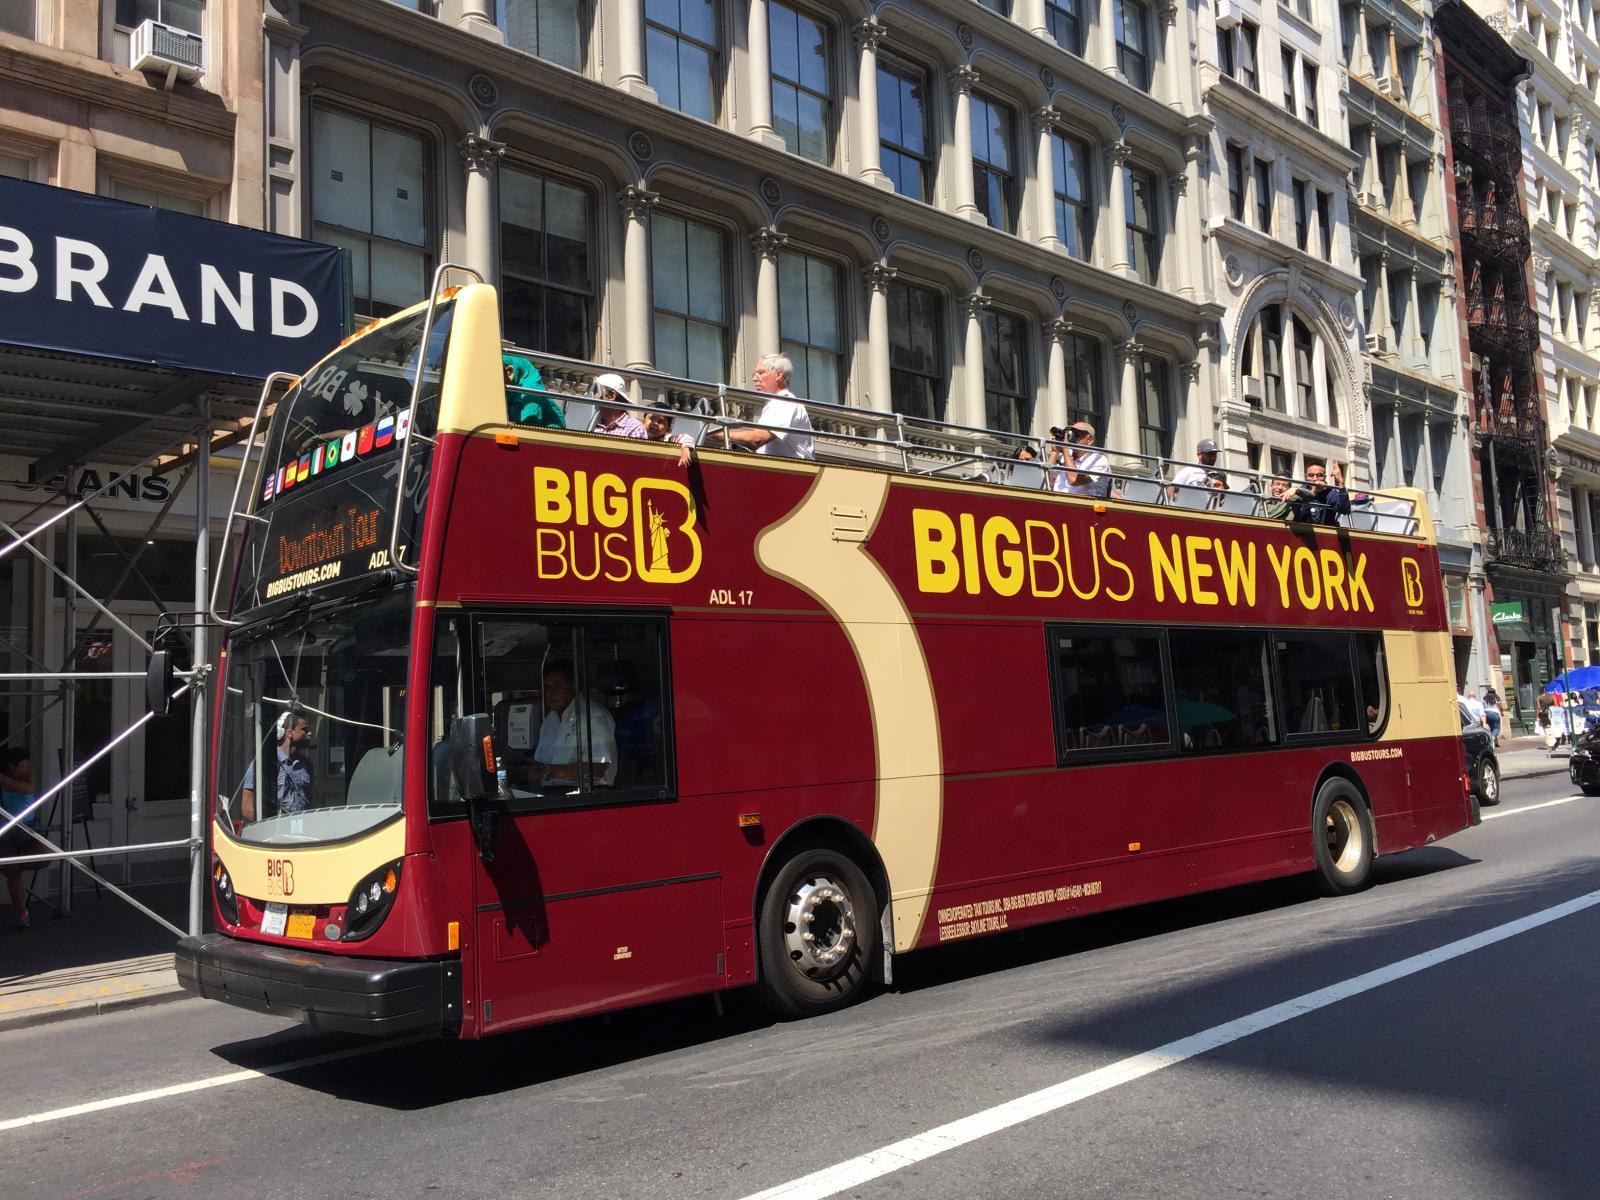 Big Red Bus NYC Bus Tour